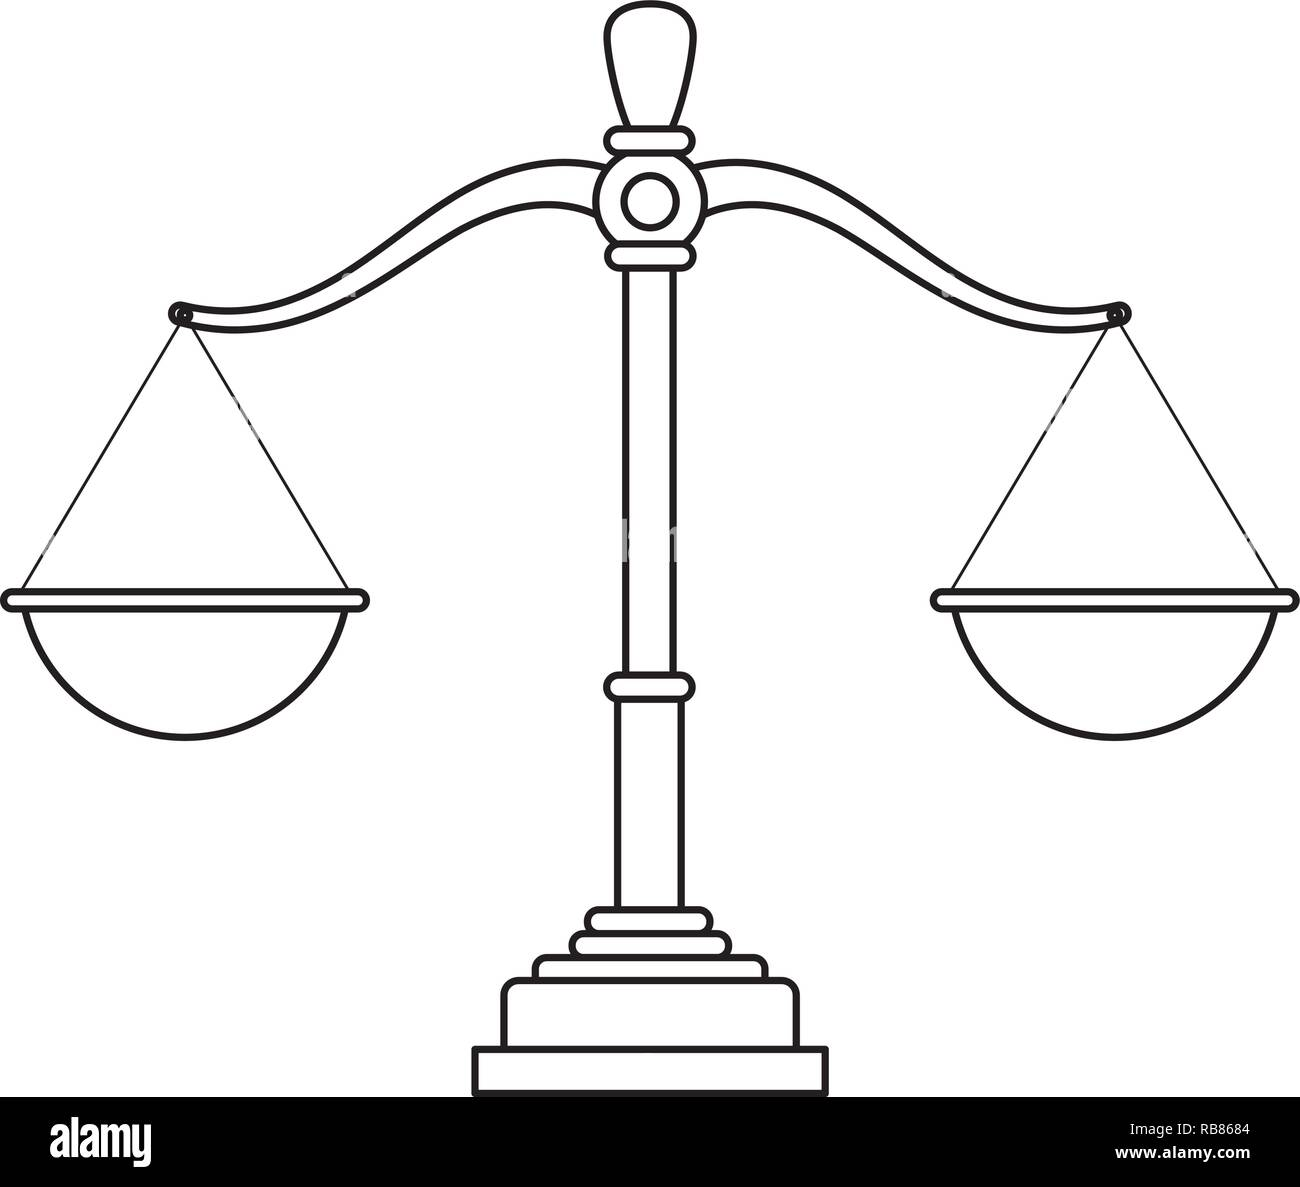 justice balance cartoon - Stock Vector